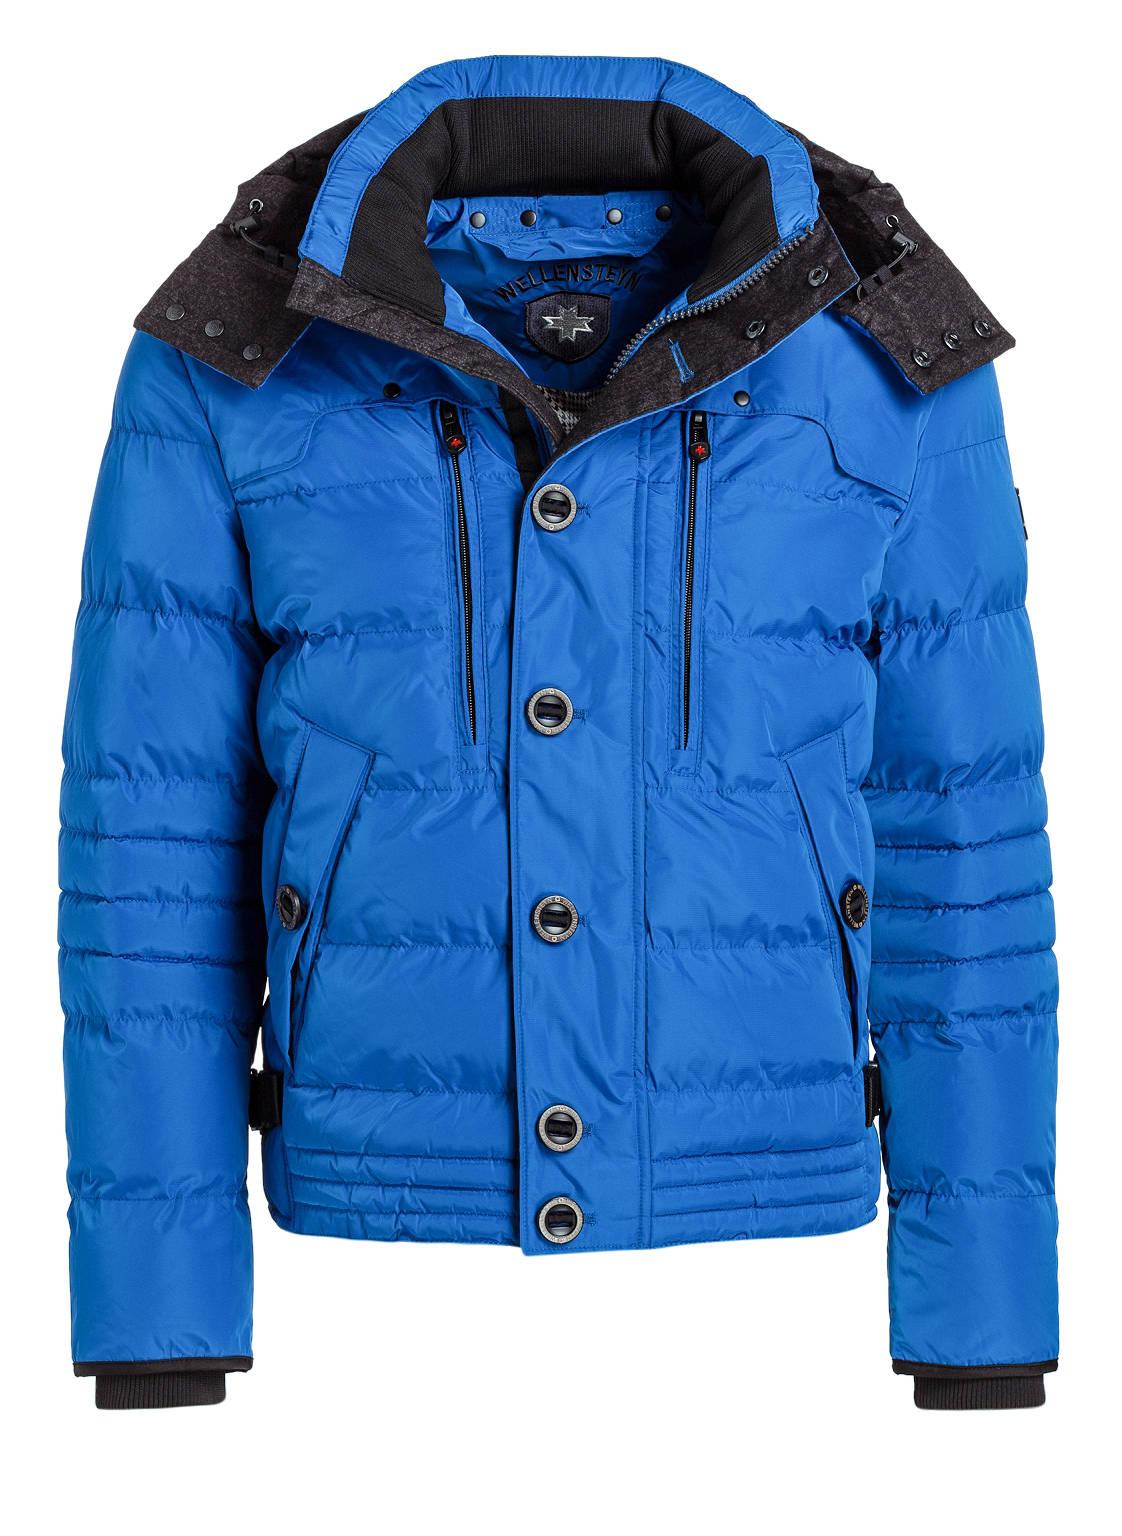 Nike winterjacke herren blau